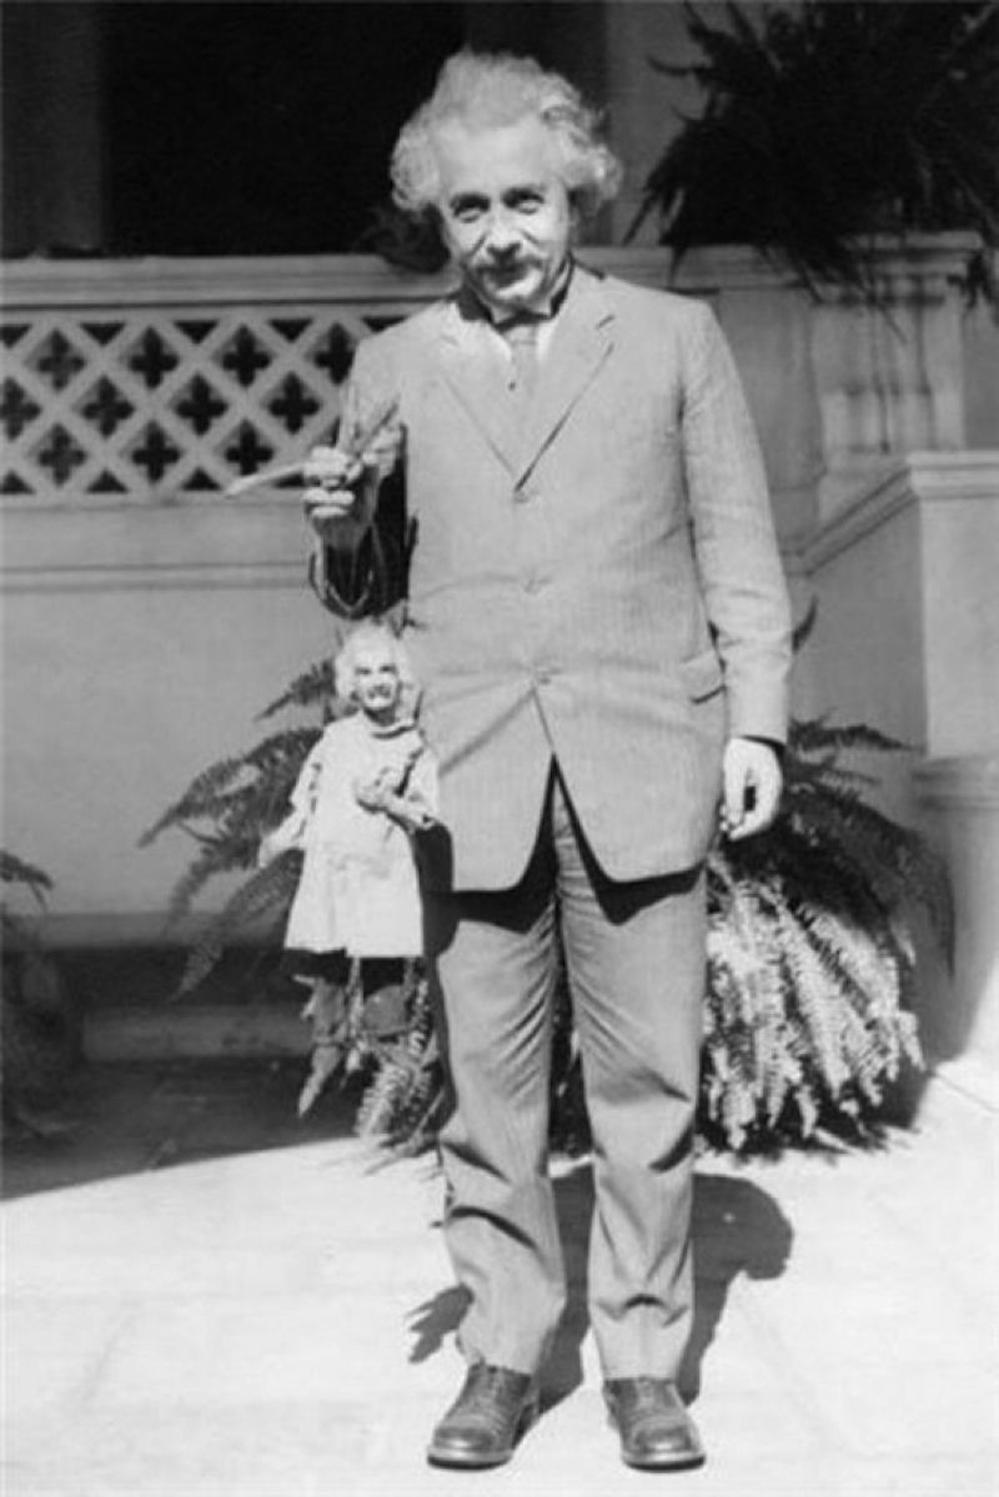 Fascinating Historical Picture of Albert Einstein in 1931